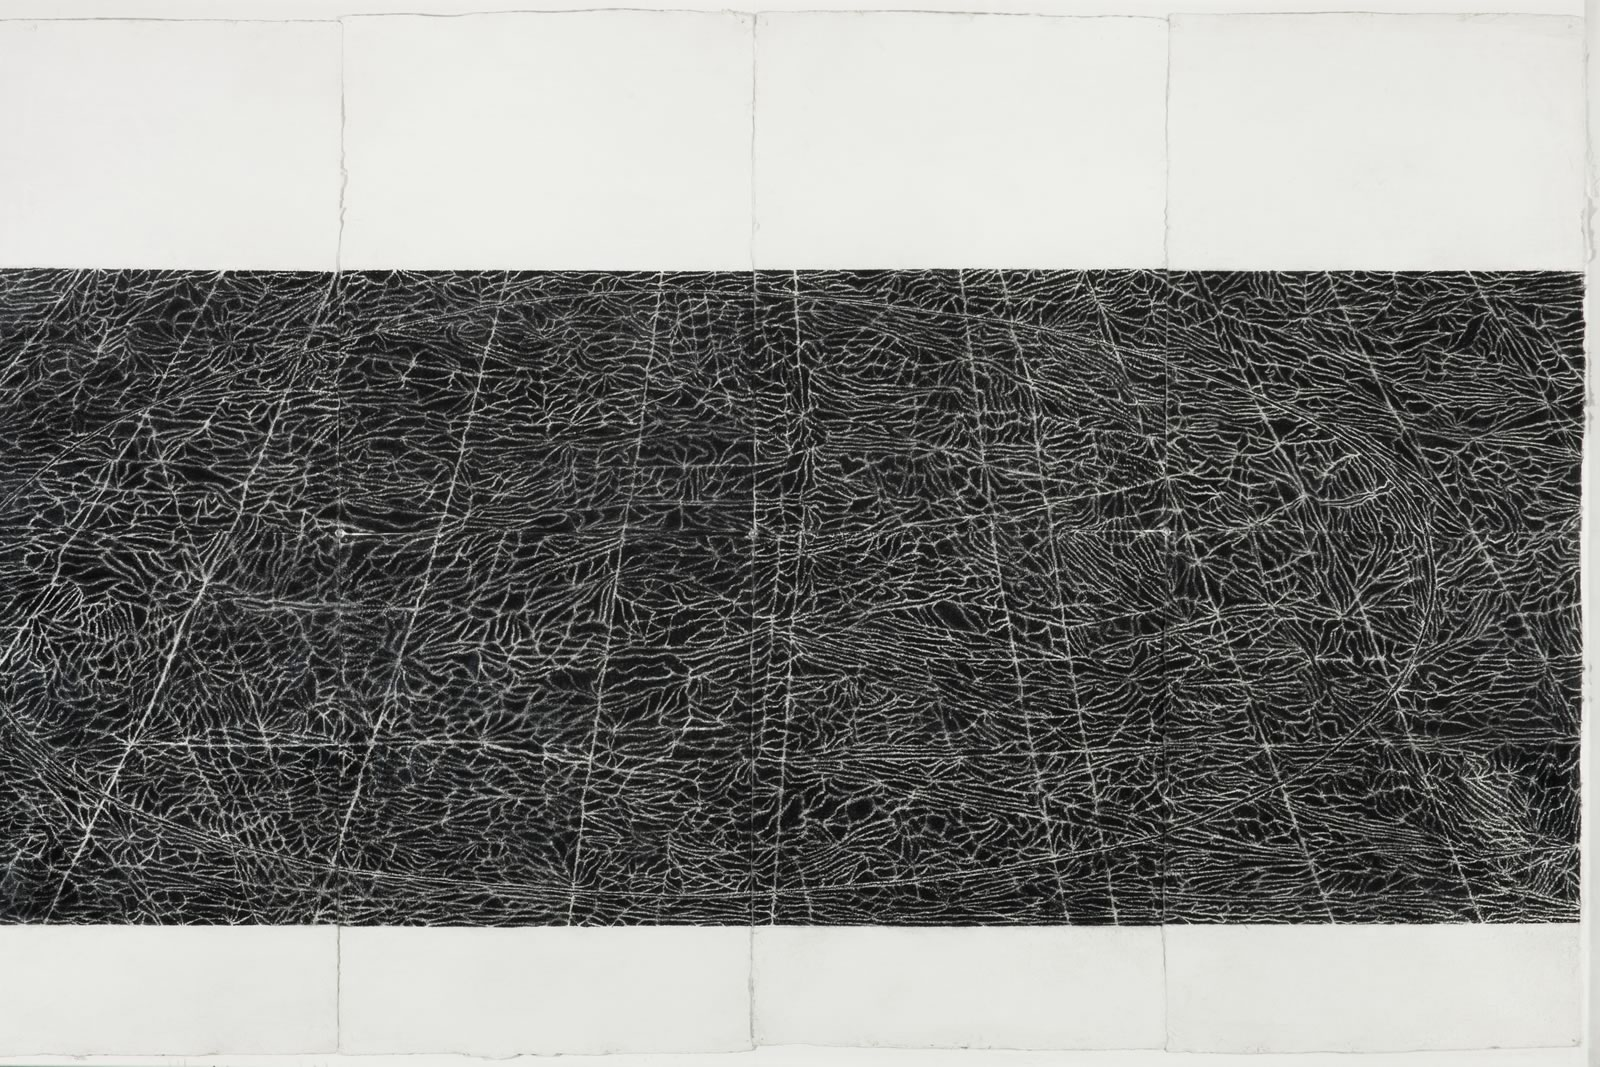 1997 Winner of The Hutchins Art Prize - Rod Stennard - Laseman's Sleep